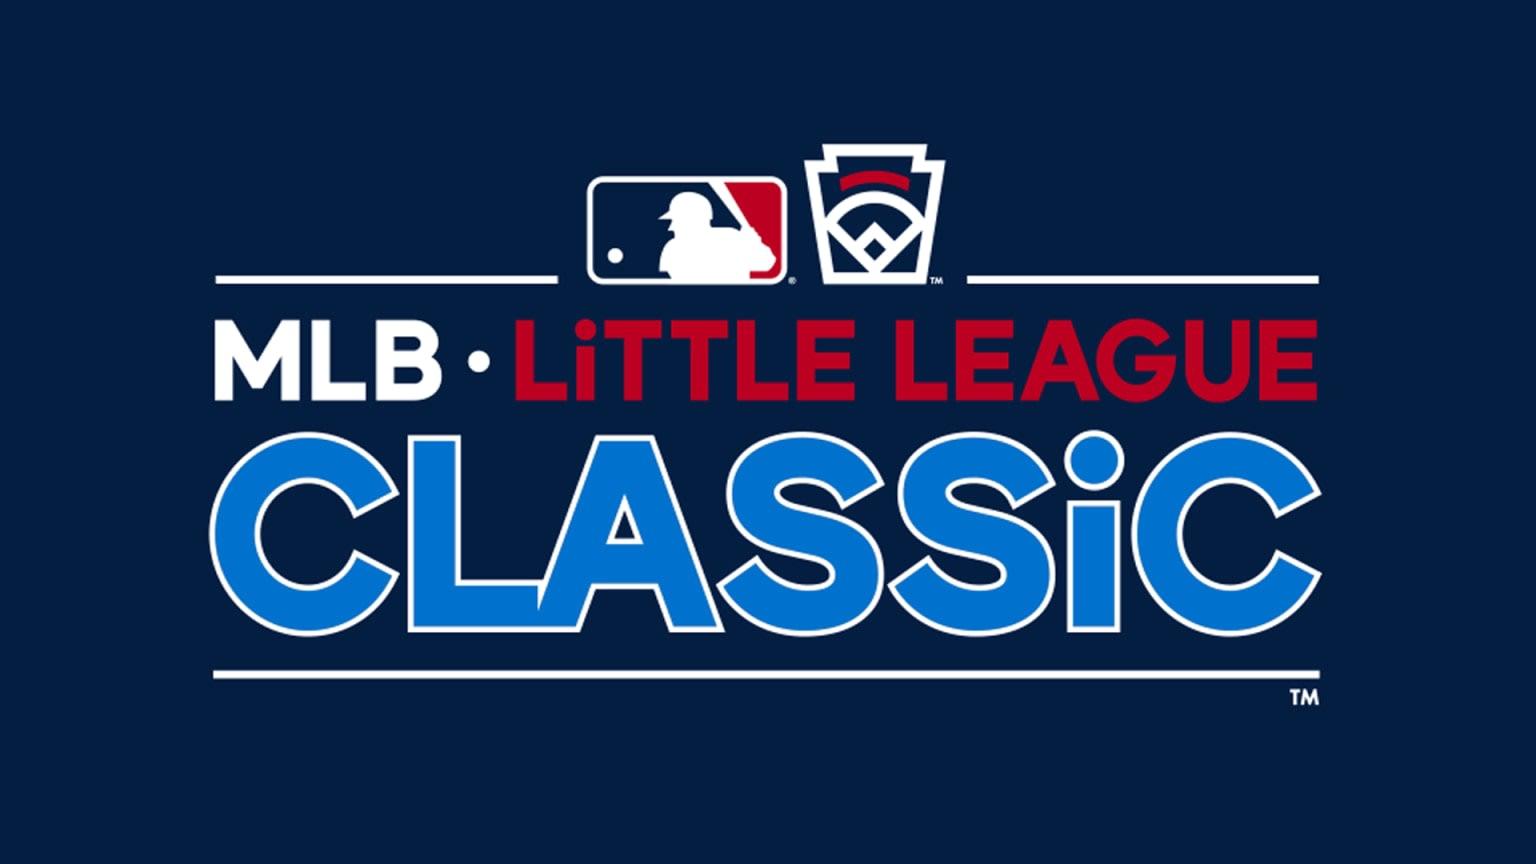 2022 MLB Little League Classic Logo